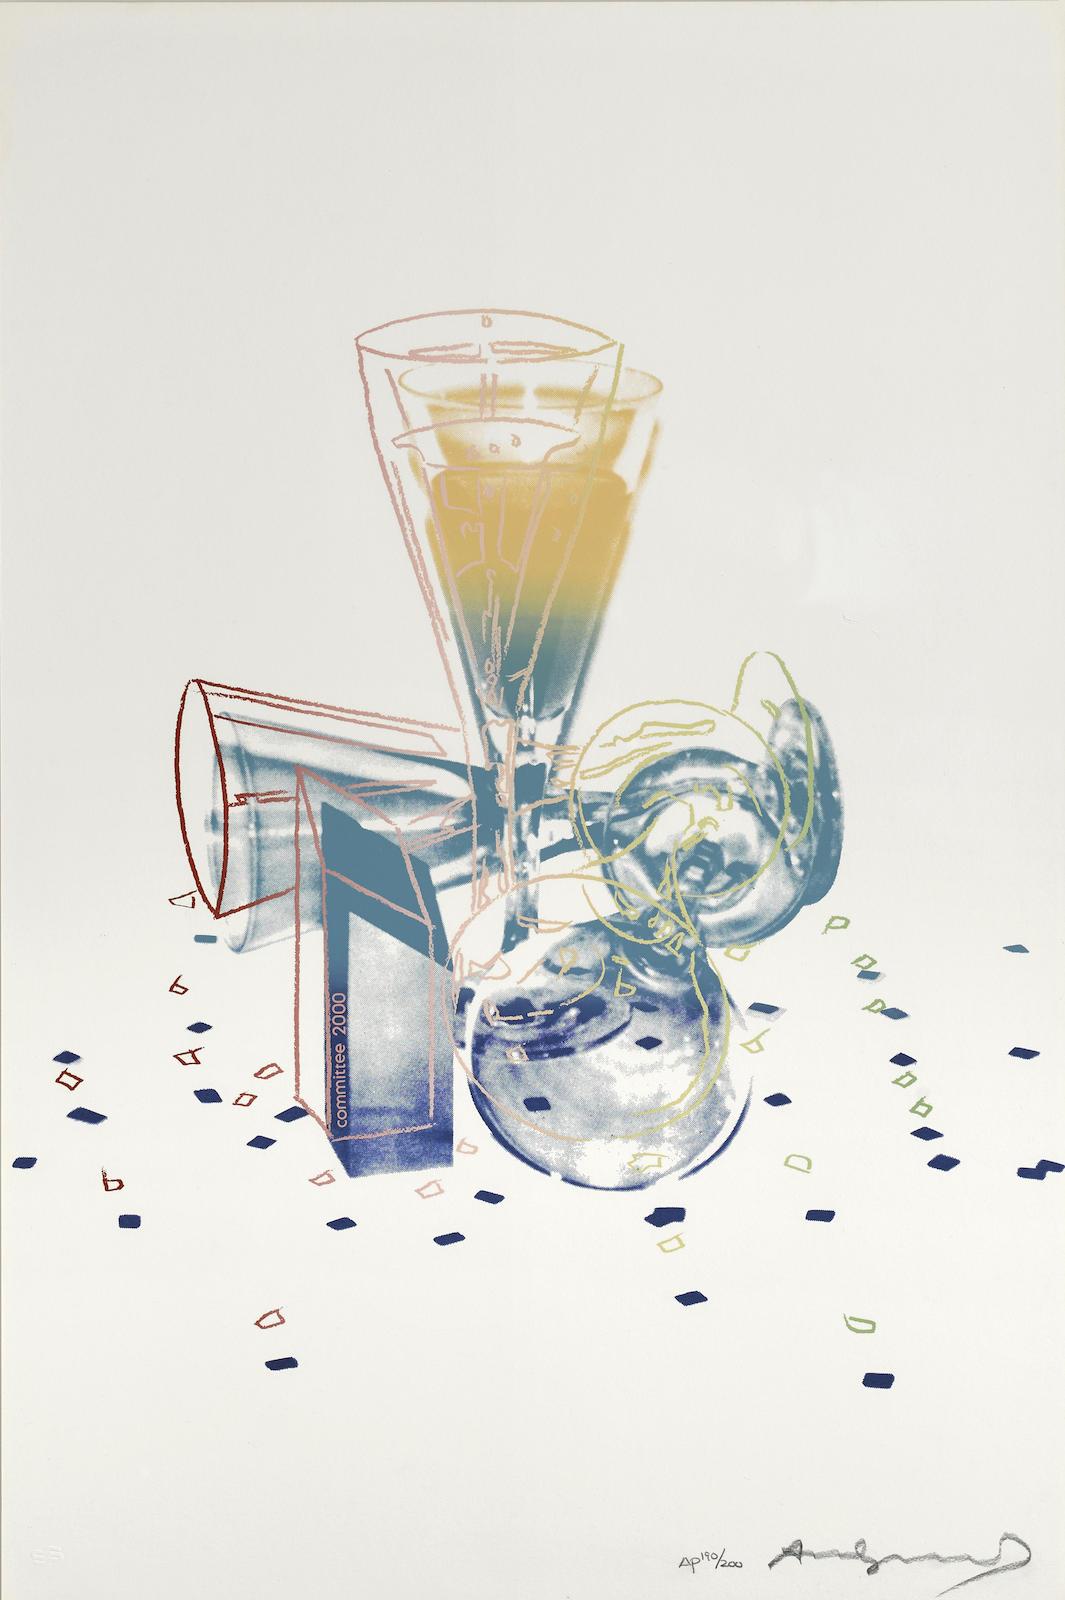 Andy Warhol-Committee 2000 (F./S. II.289)-1982